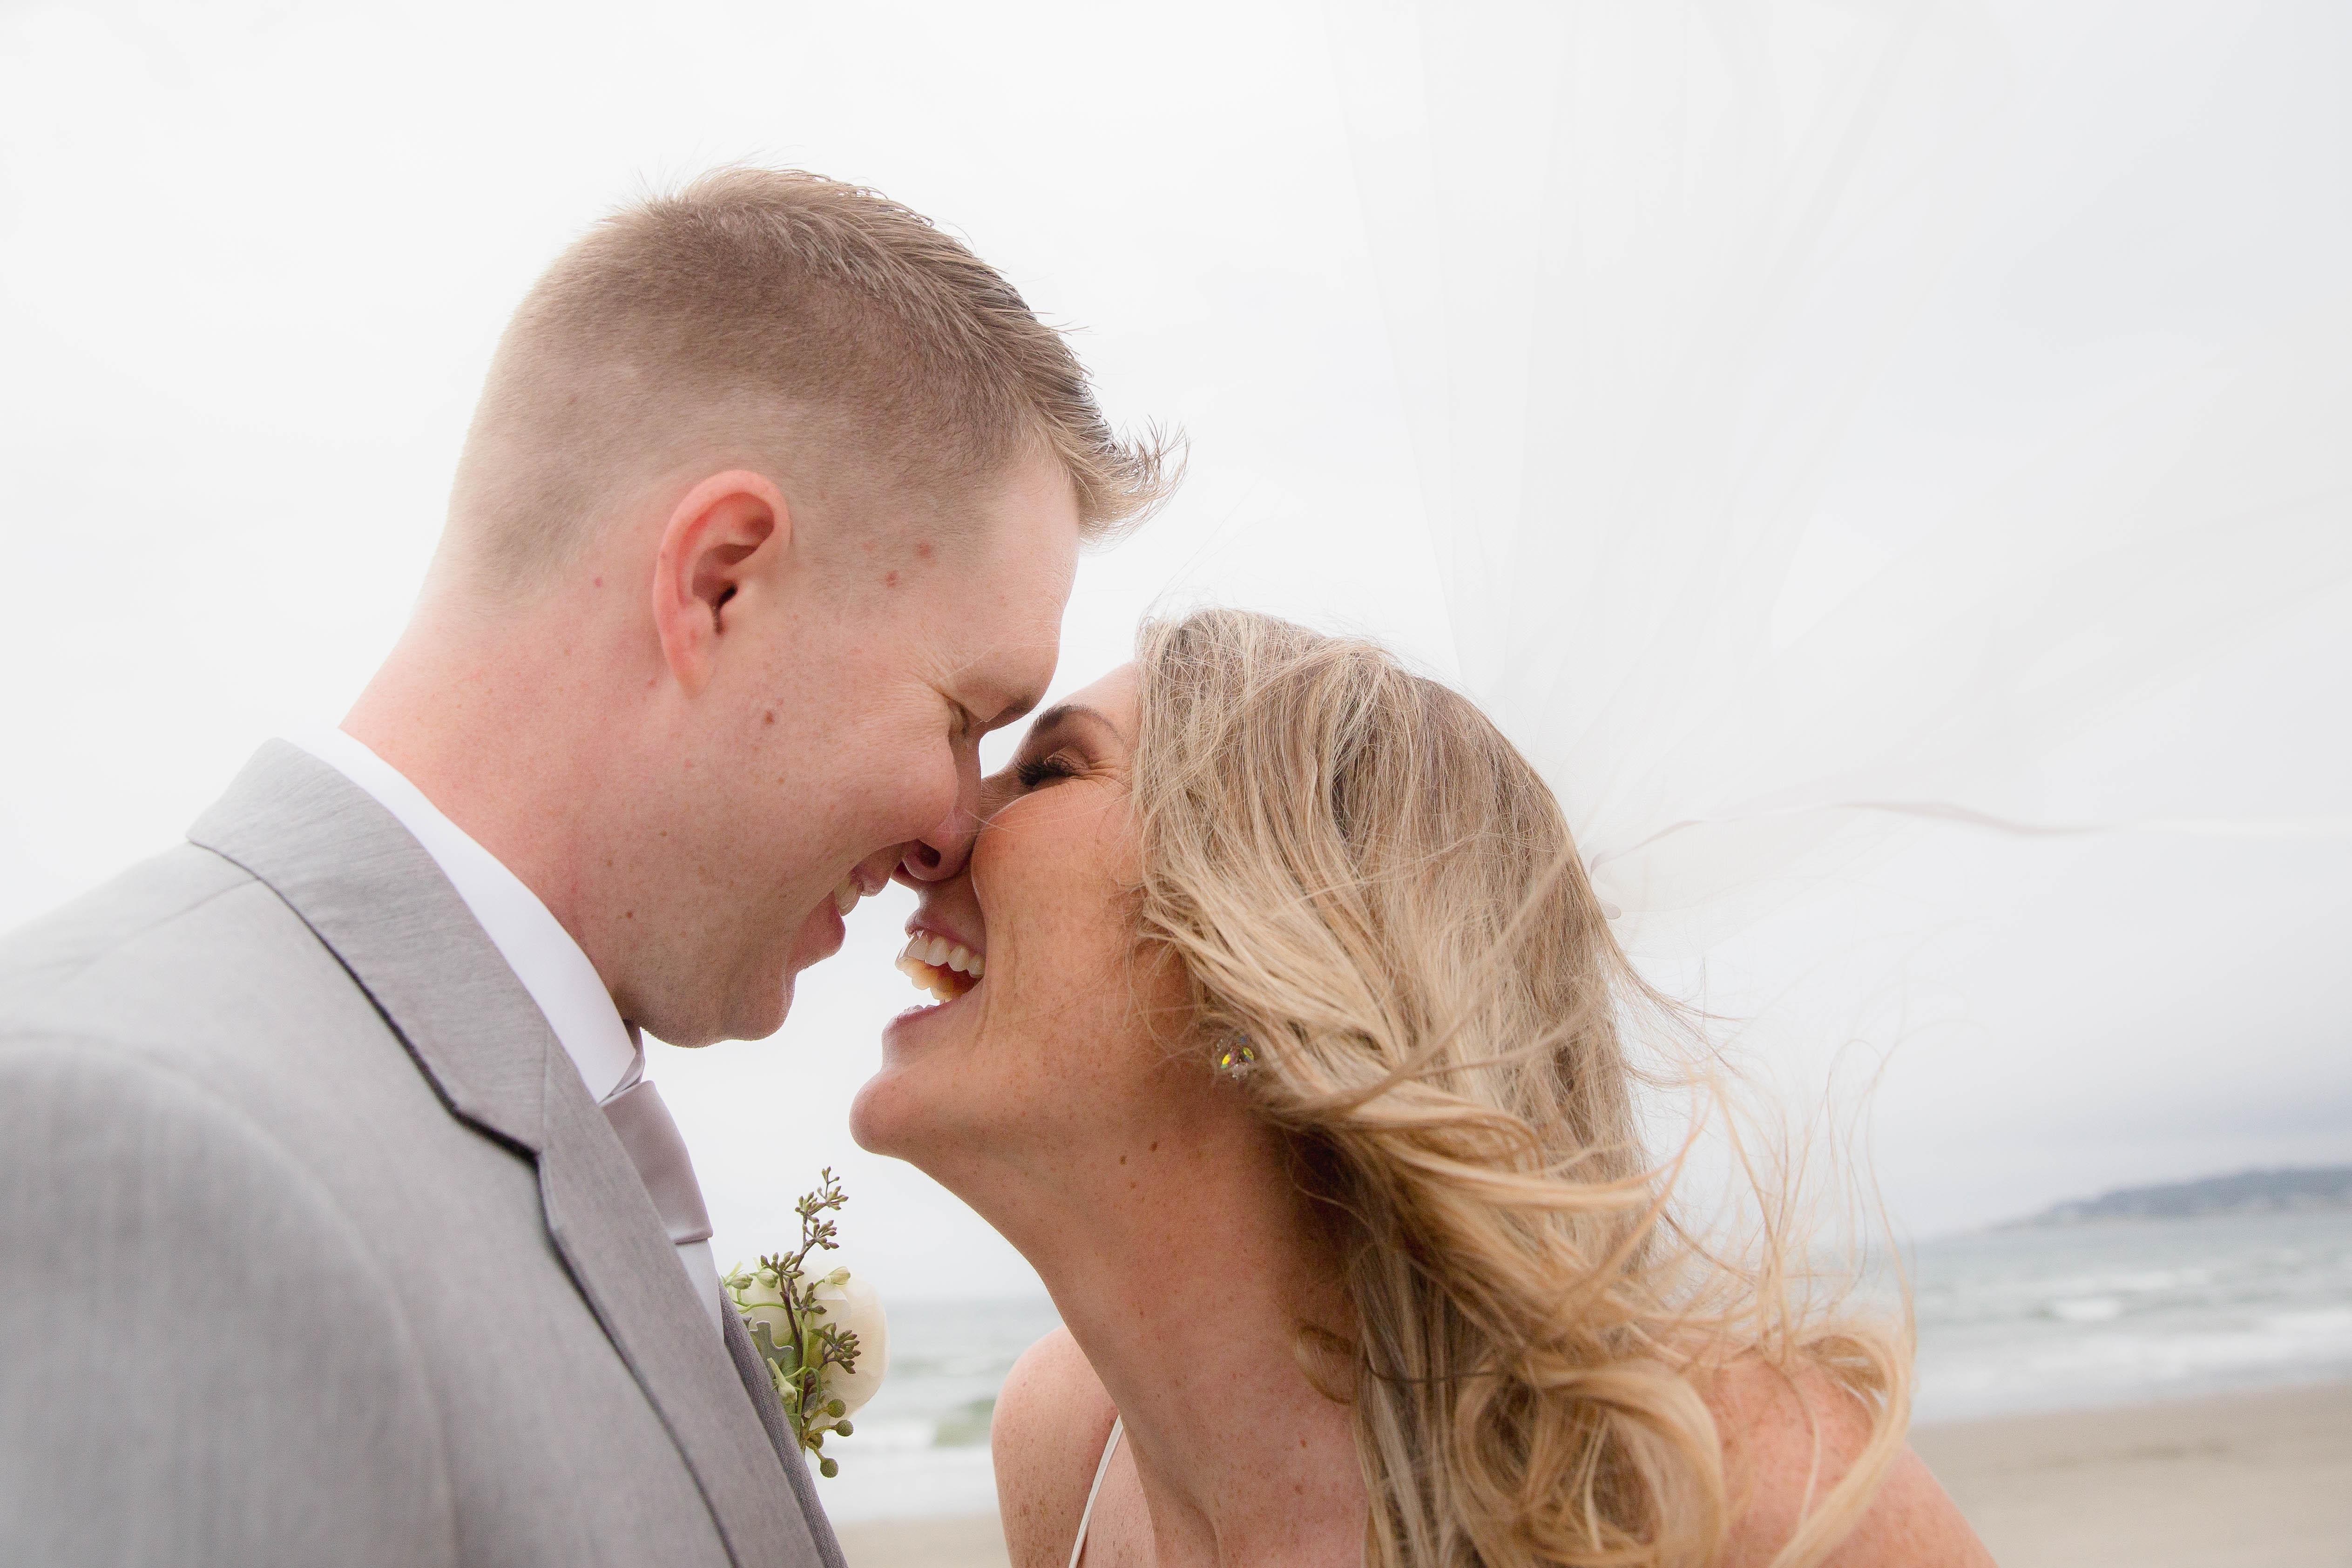 wedding, Rhode Island, beach, photography, couple, love, wedding photography, narragansett